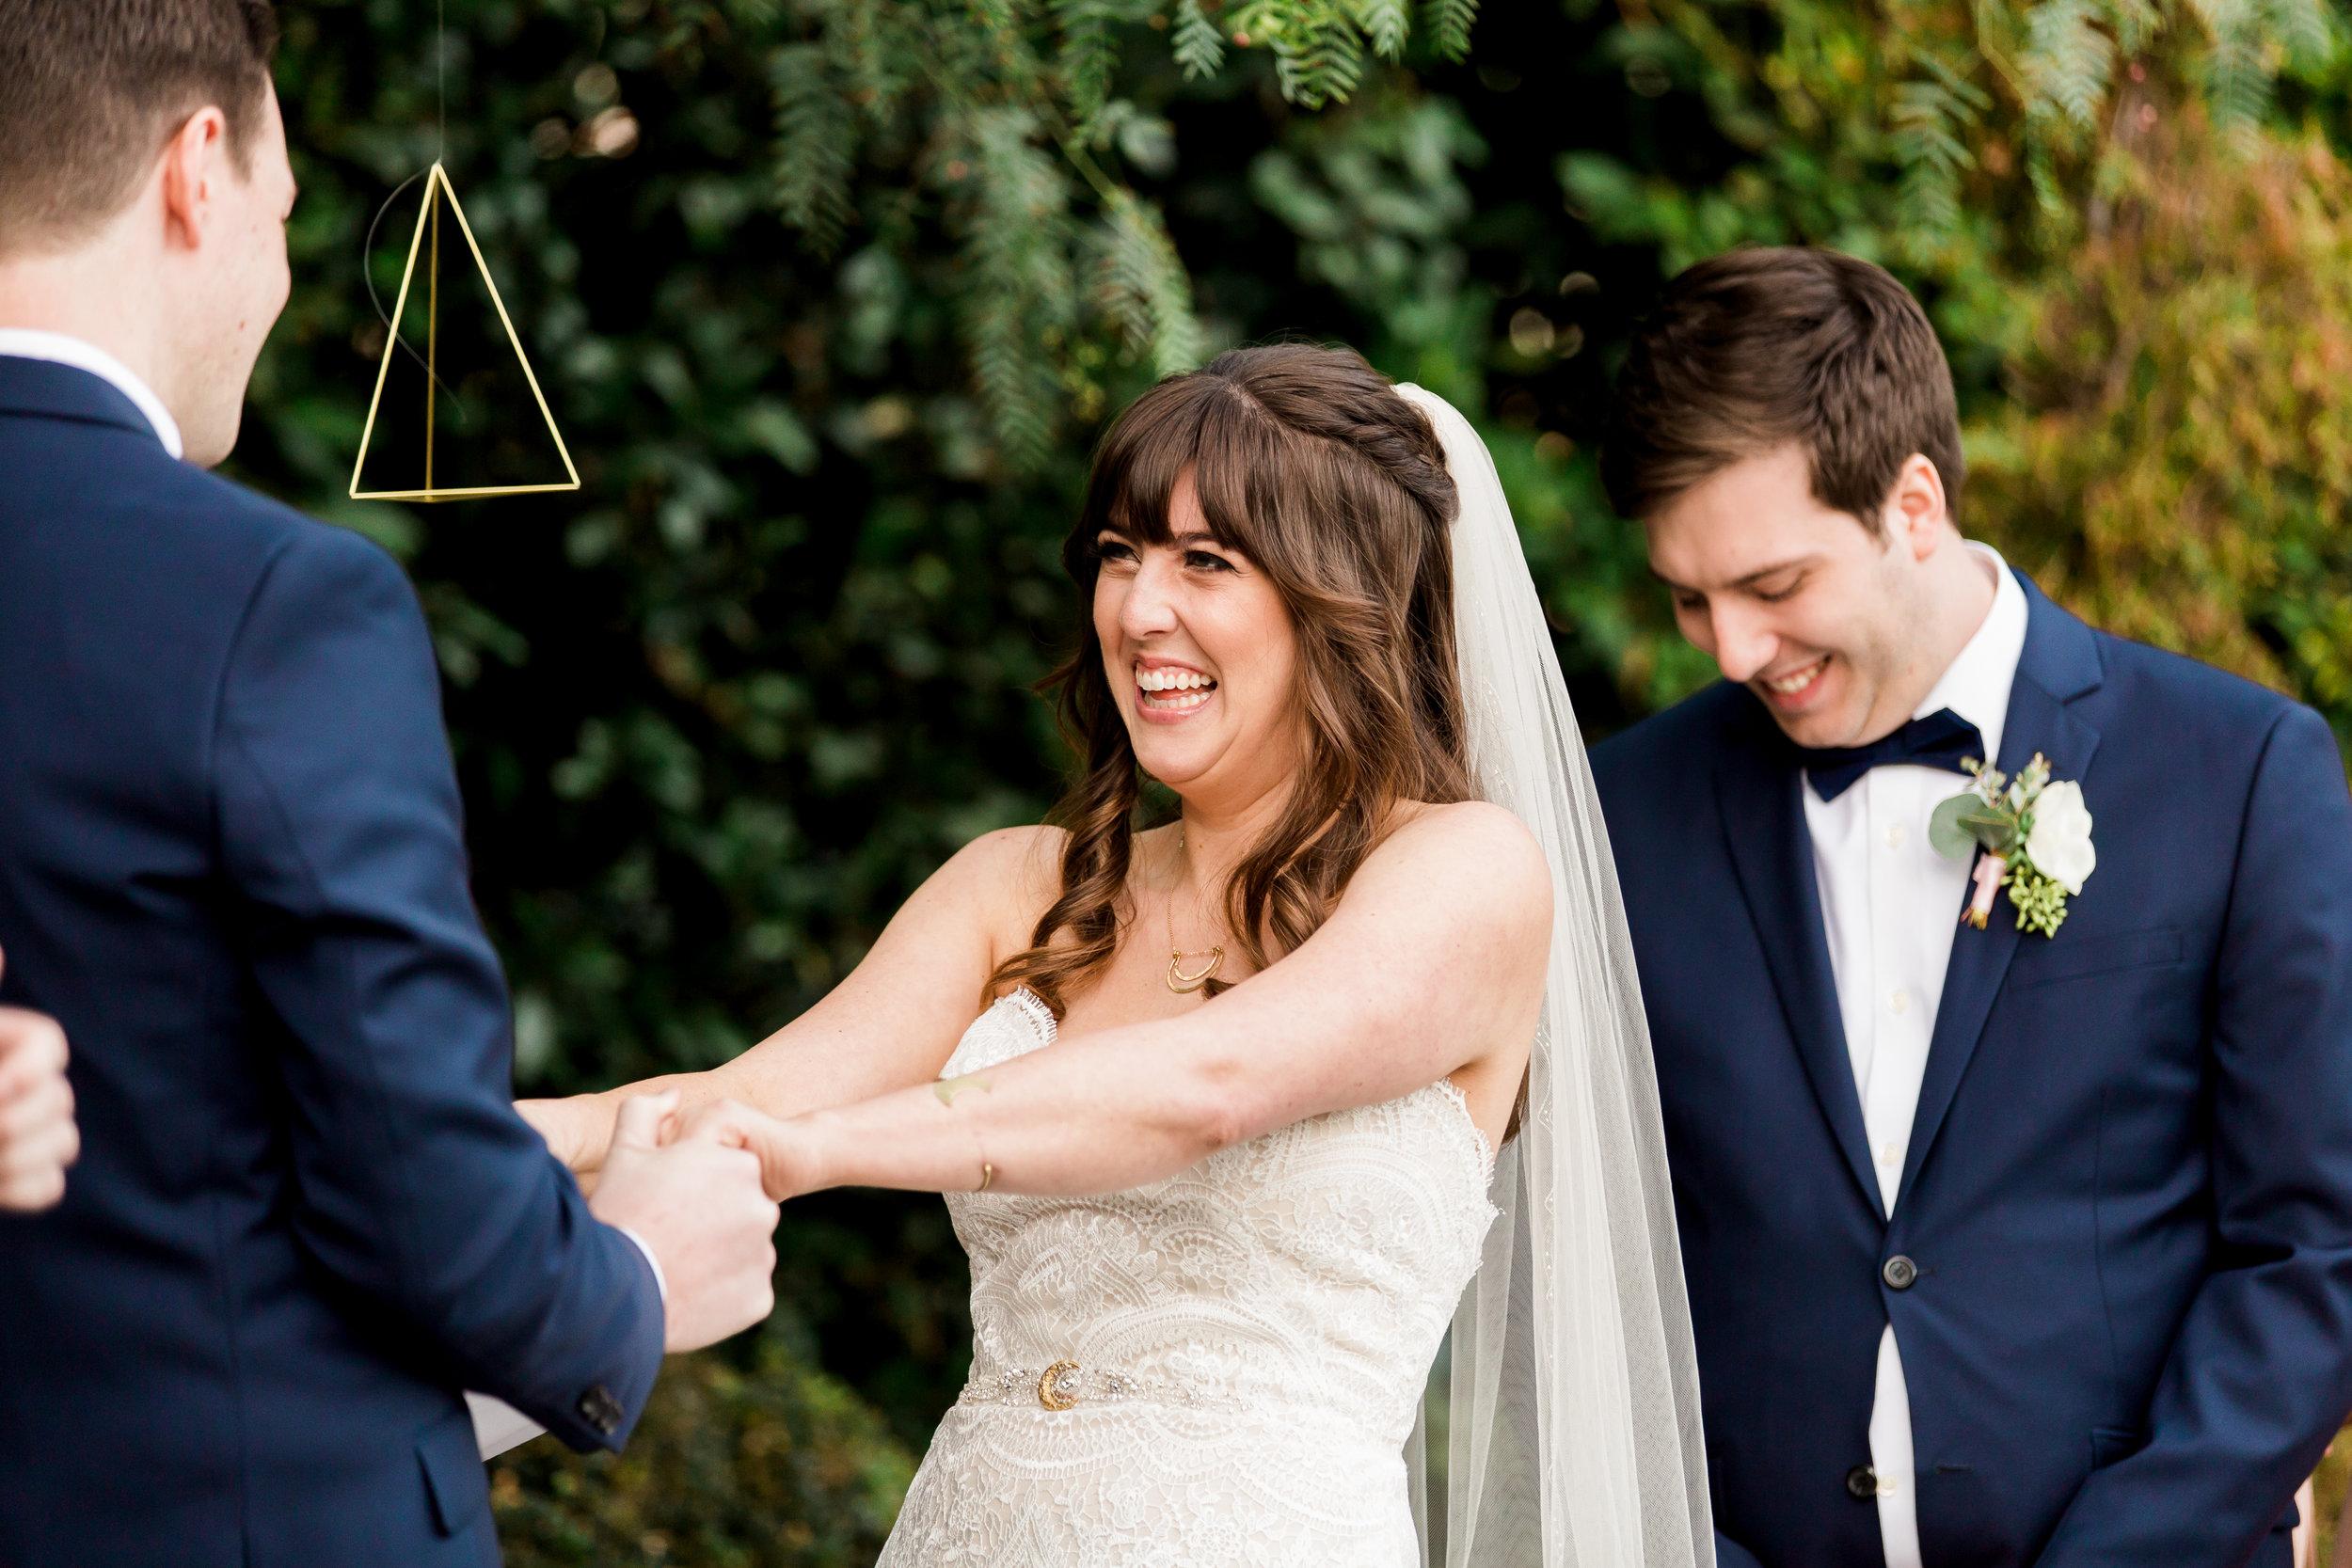 0634_Michael-and-Sarahs-wedding.jpg